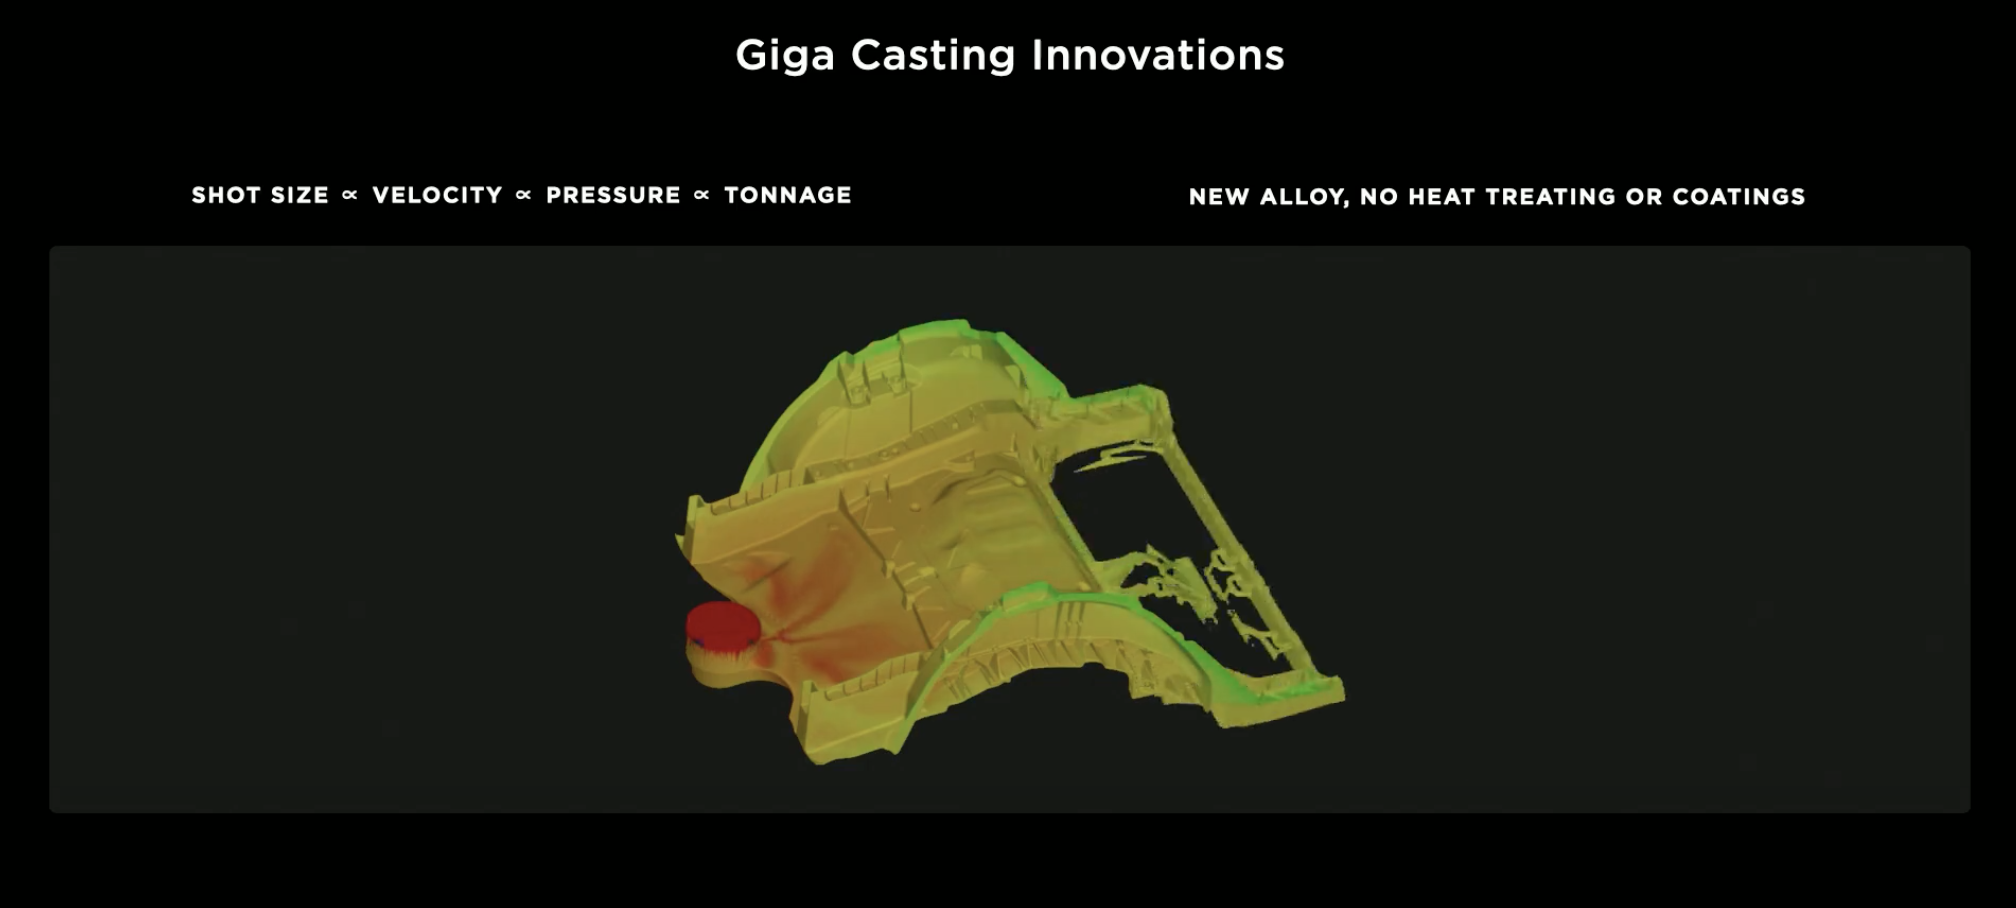 tesla-giga-casting-innovations